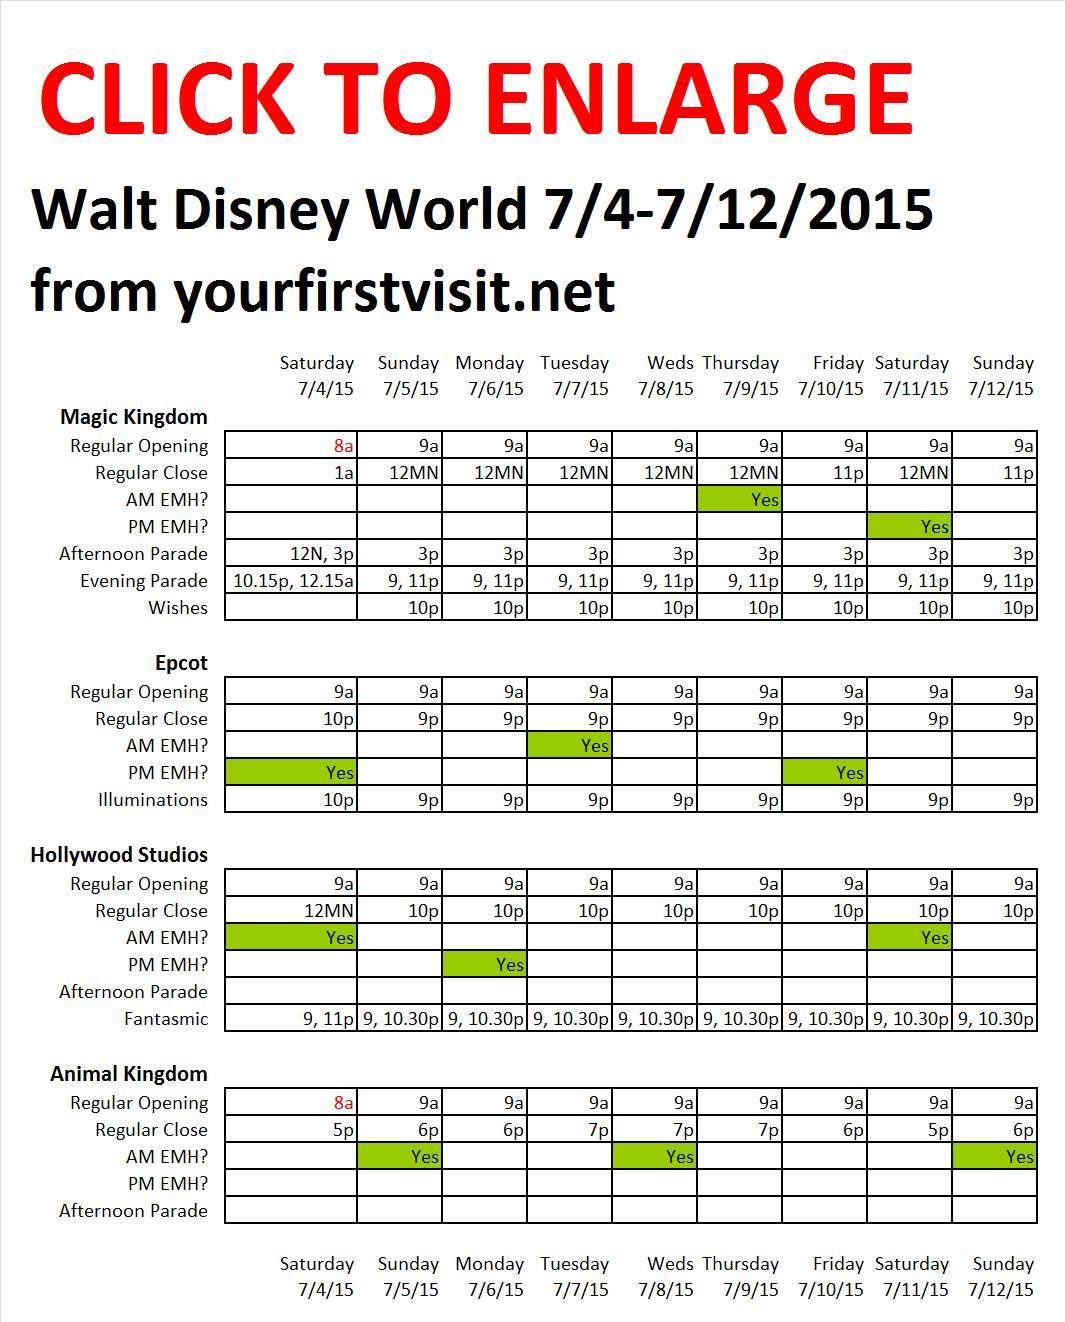 Disney World 7-4 to 7-12-2015 from yourfirstvisit.net